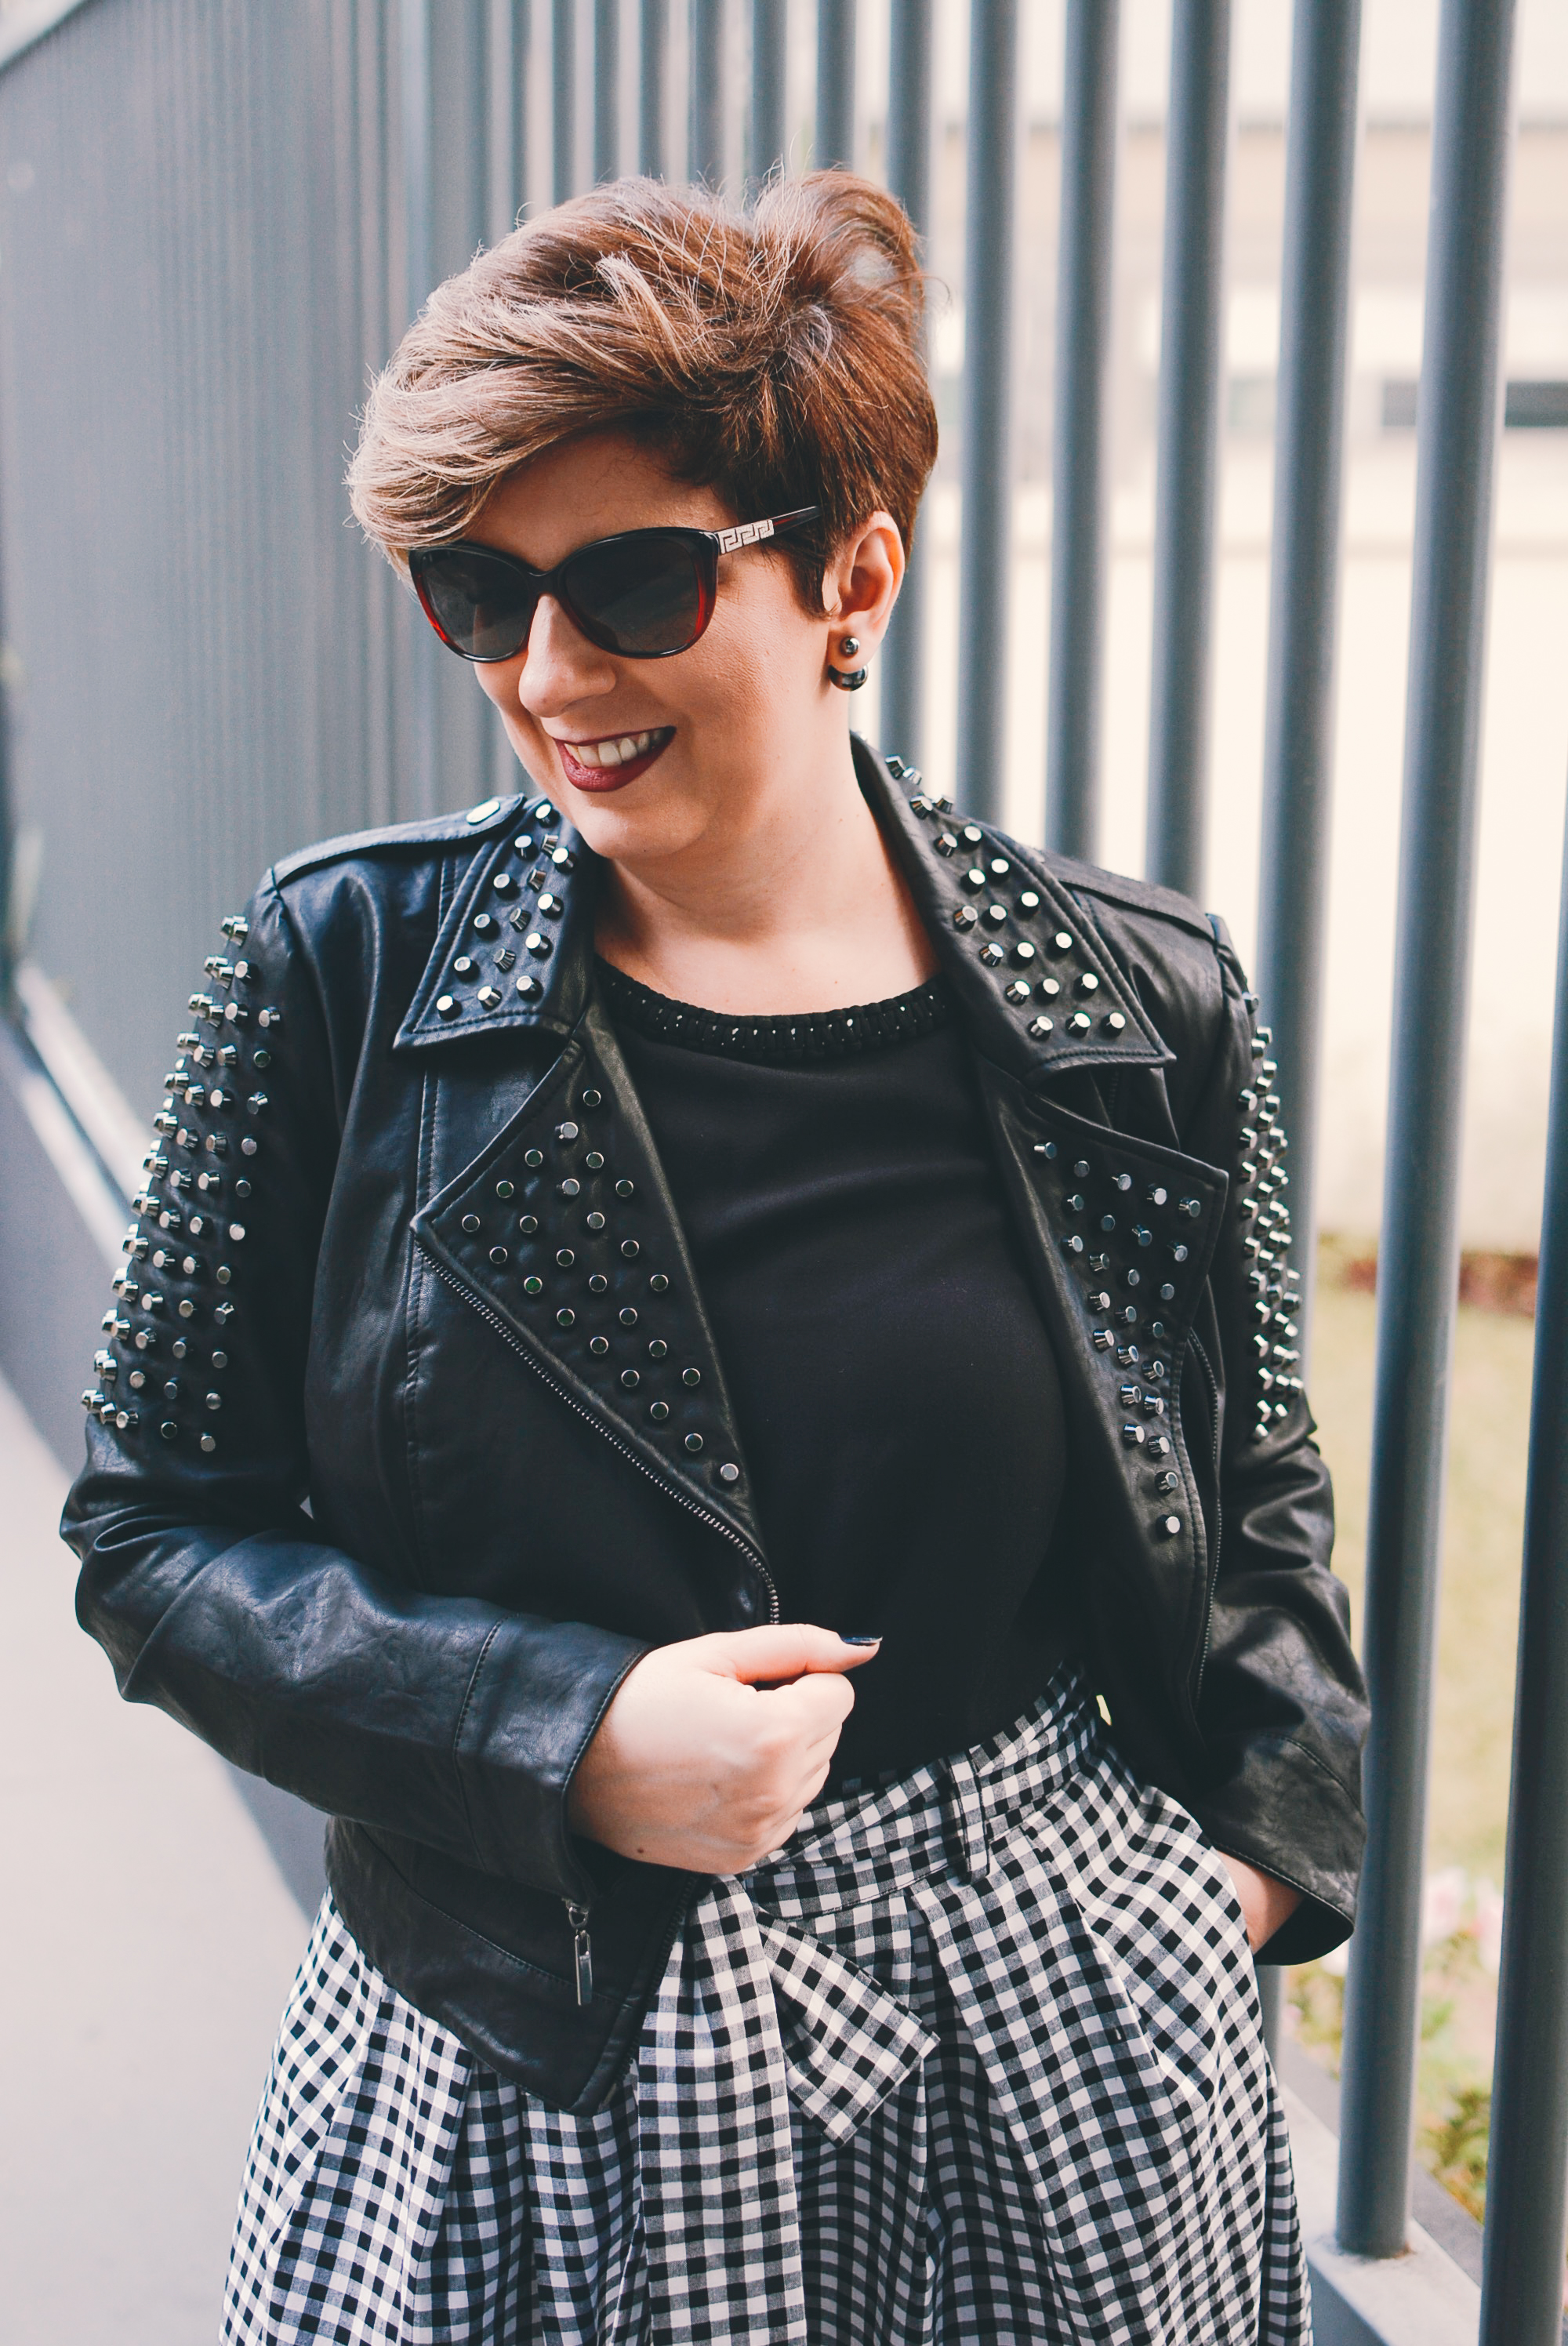 estampa_vichy_e_bomber_jacket_look_do_dia_por_alessandra_faria